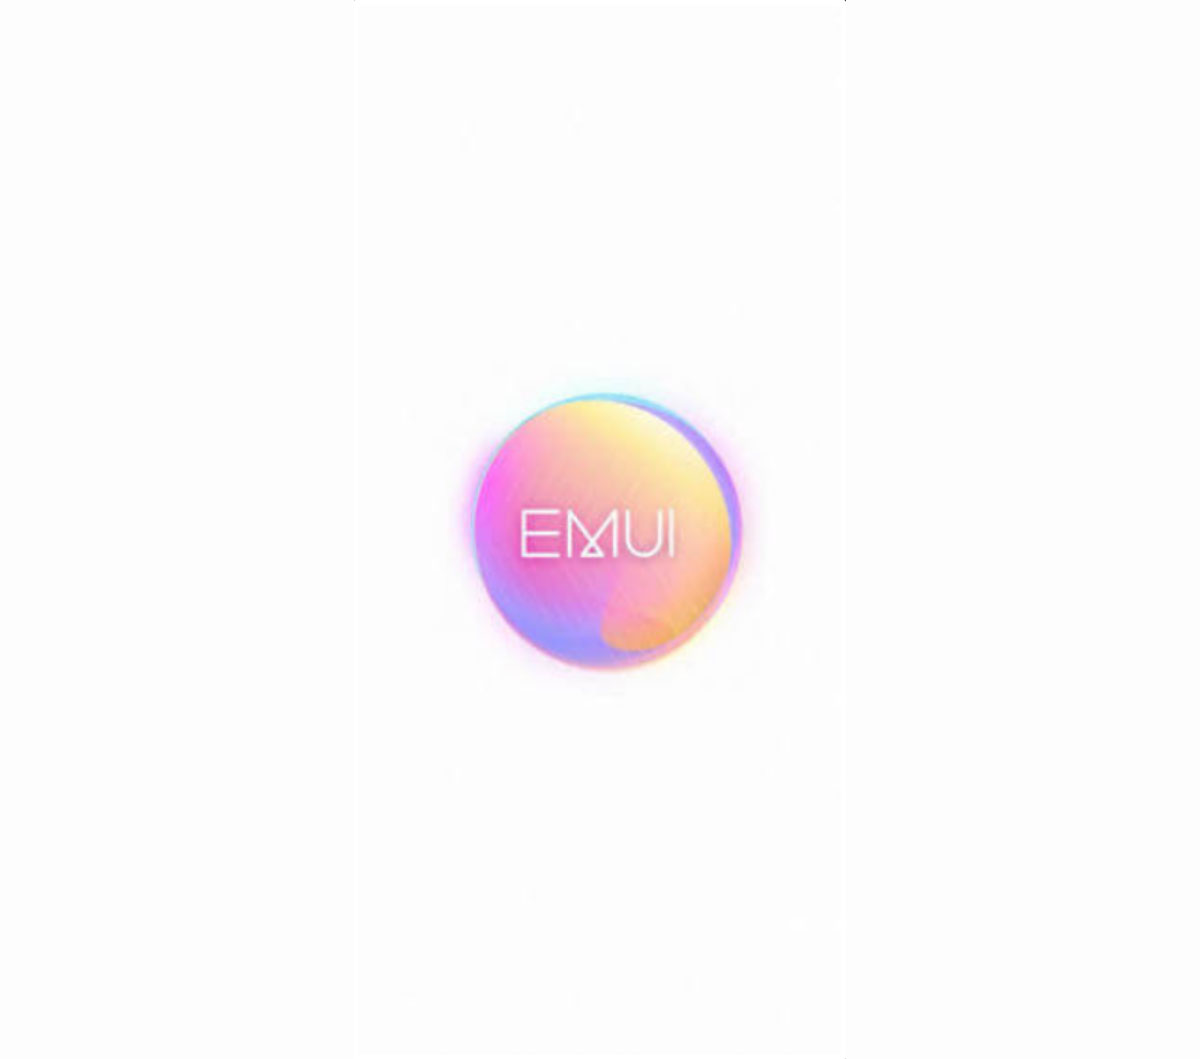 EMUI 10 набазе Android Qуже готова для смартфонов Huawei неофициально